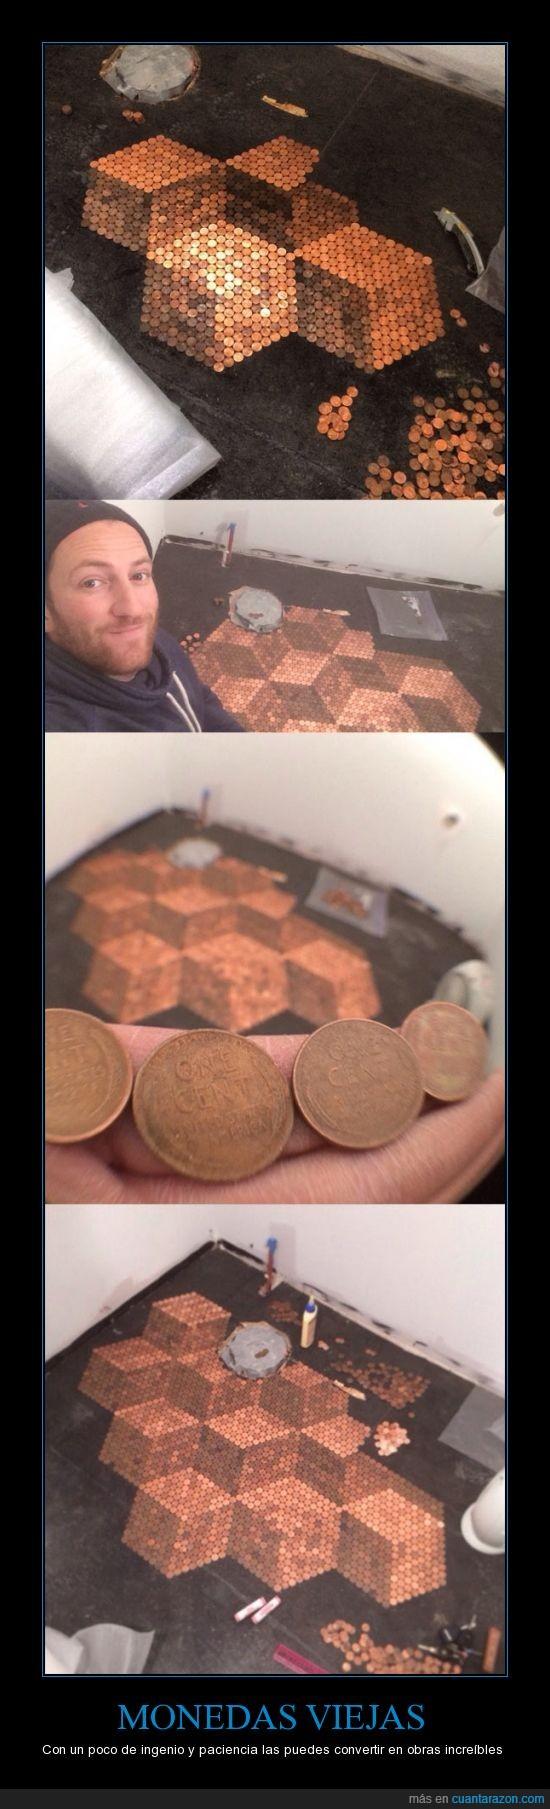 decoracion,esfuerzo,ingenio,monedas,suelo,viejas